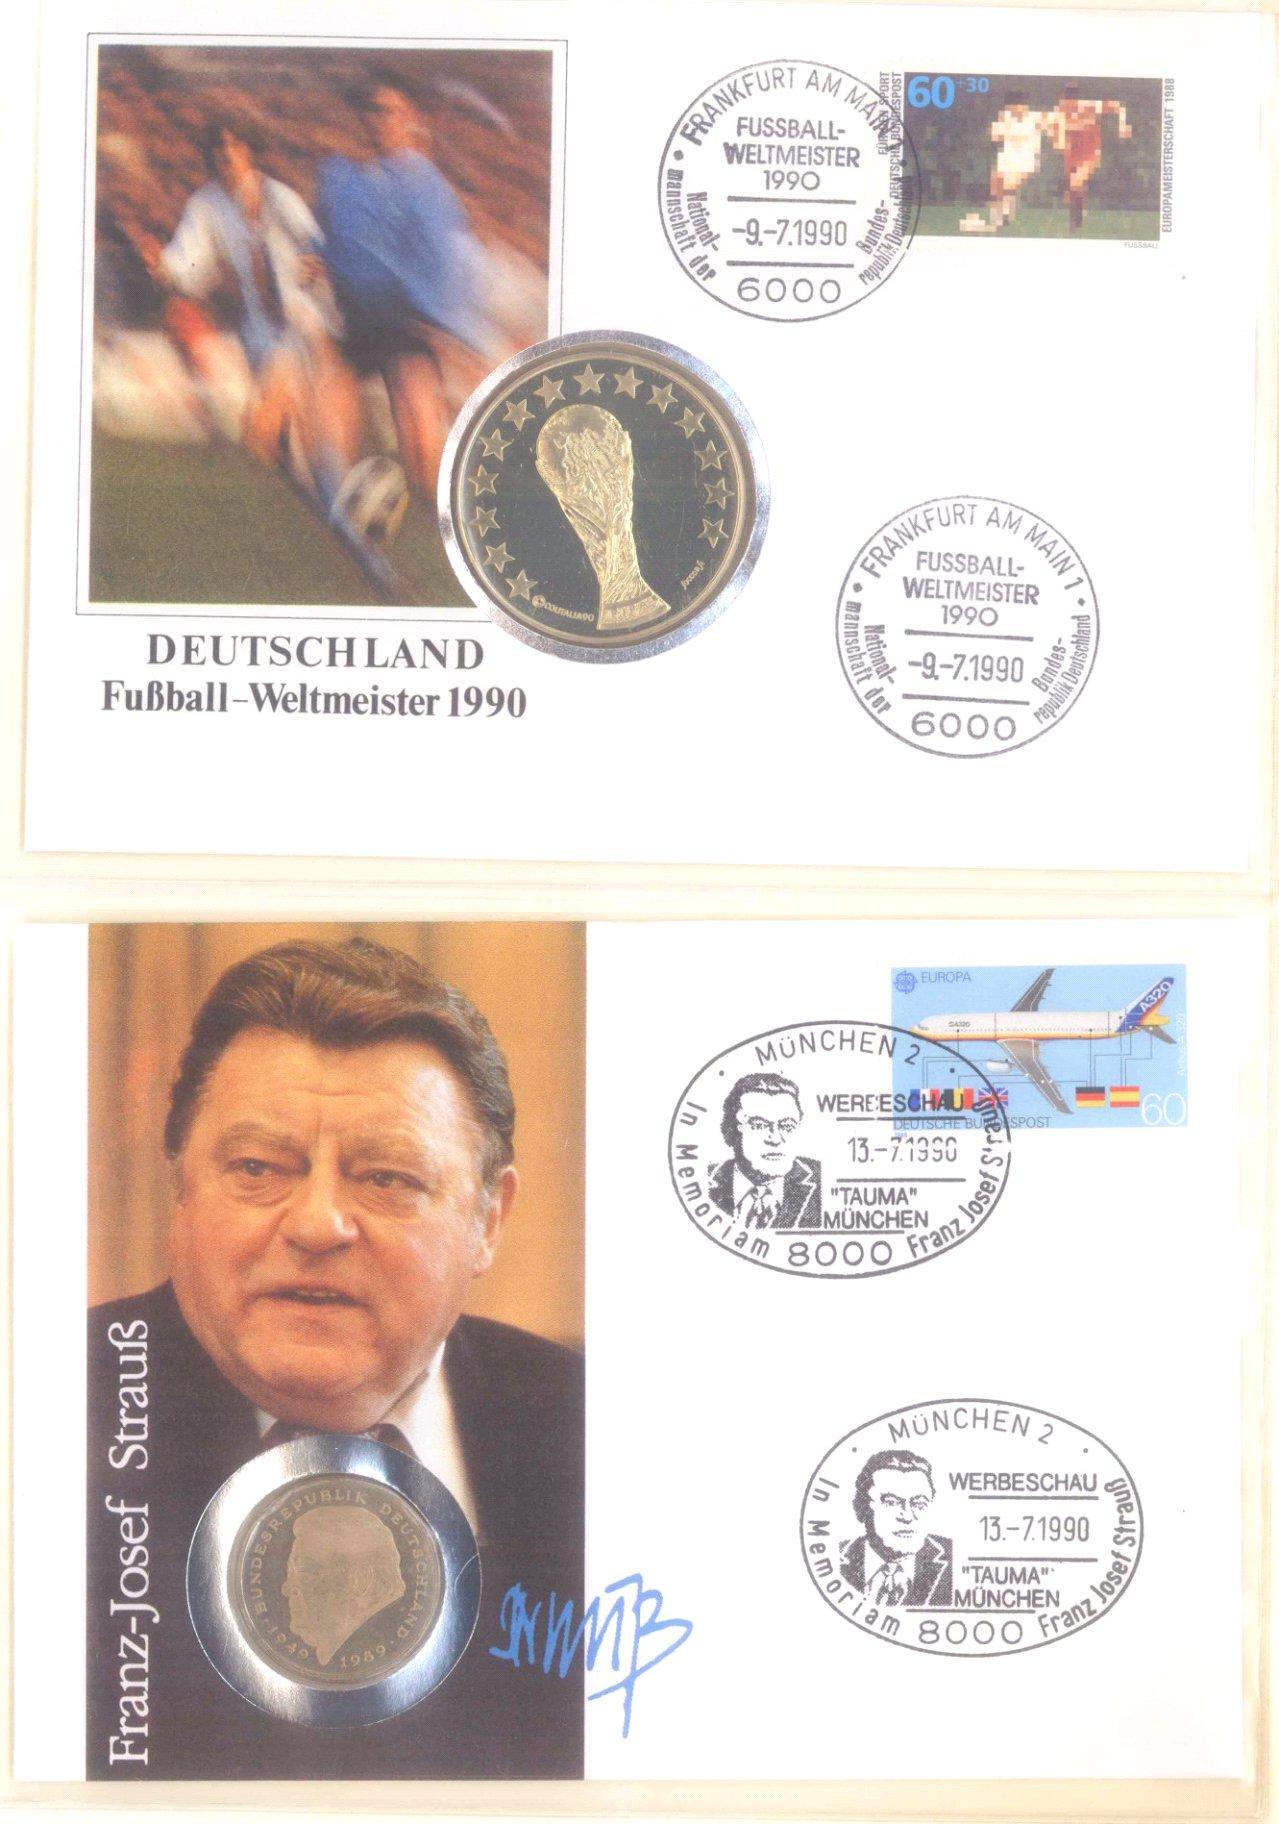 Sammlung Borek Numisbriefe im Ringbinder-2